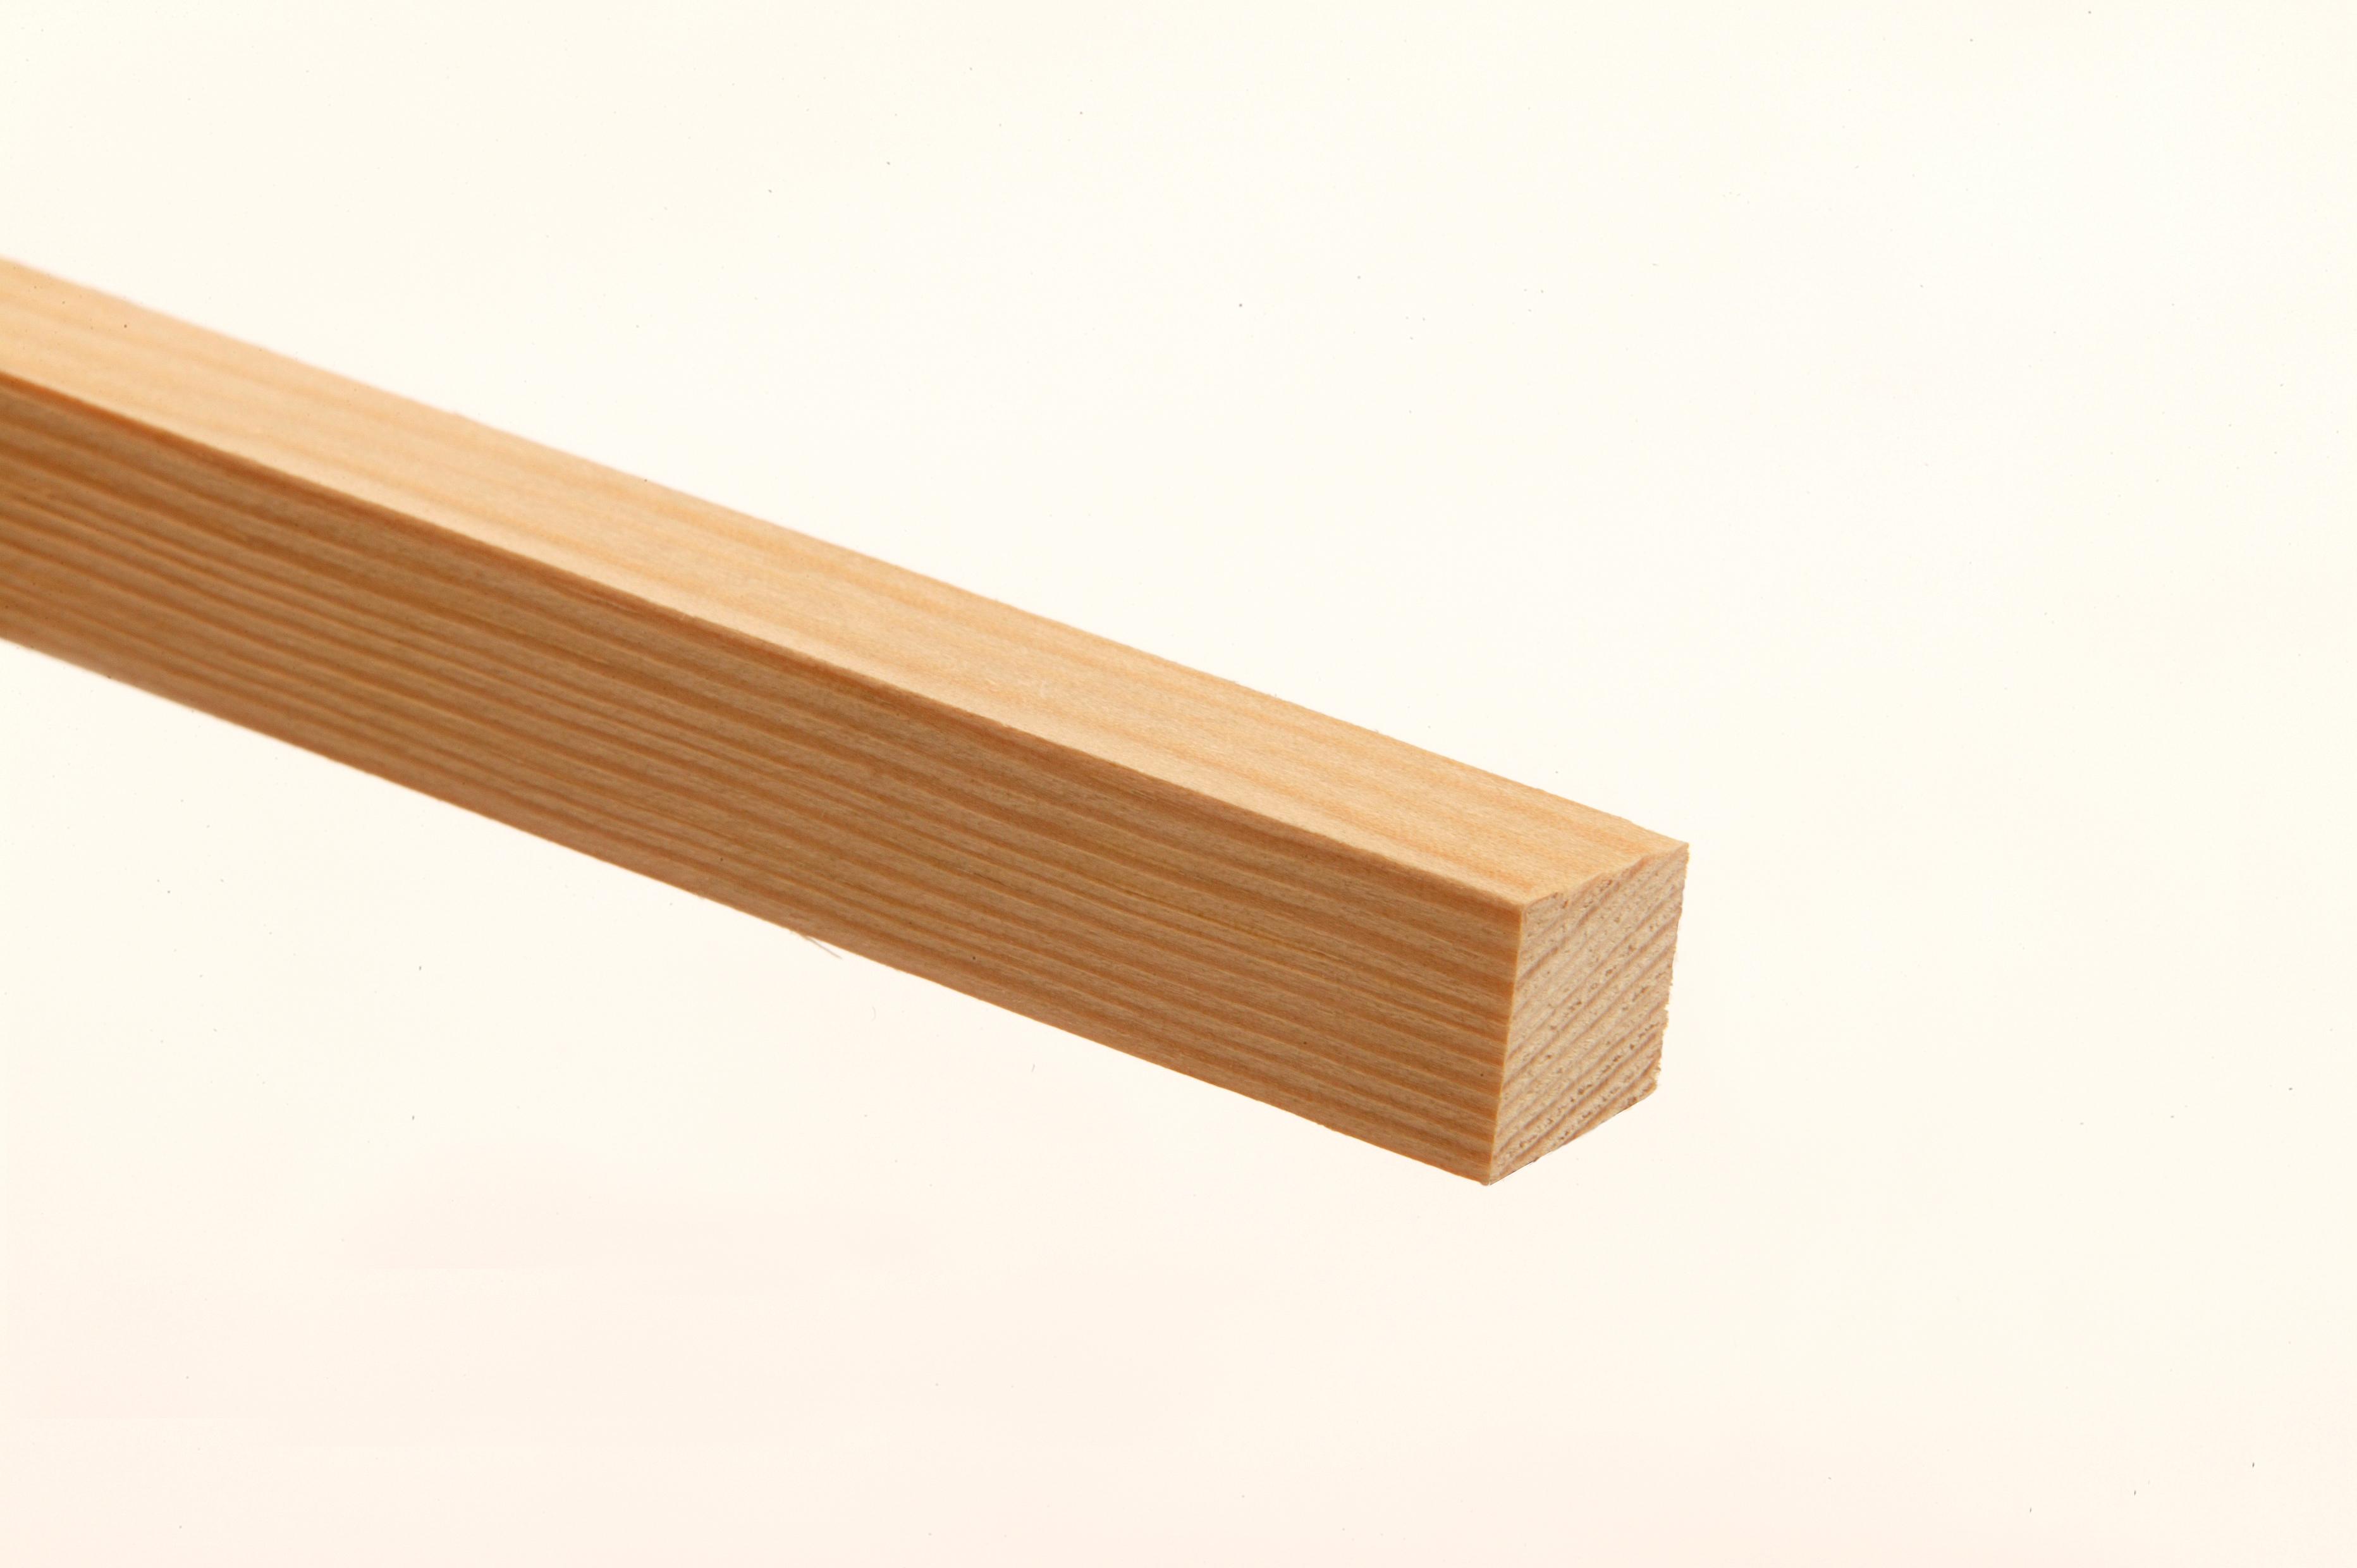 20 Pine PSE Stripwood 20 x 20 x 2400mm